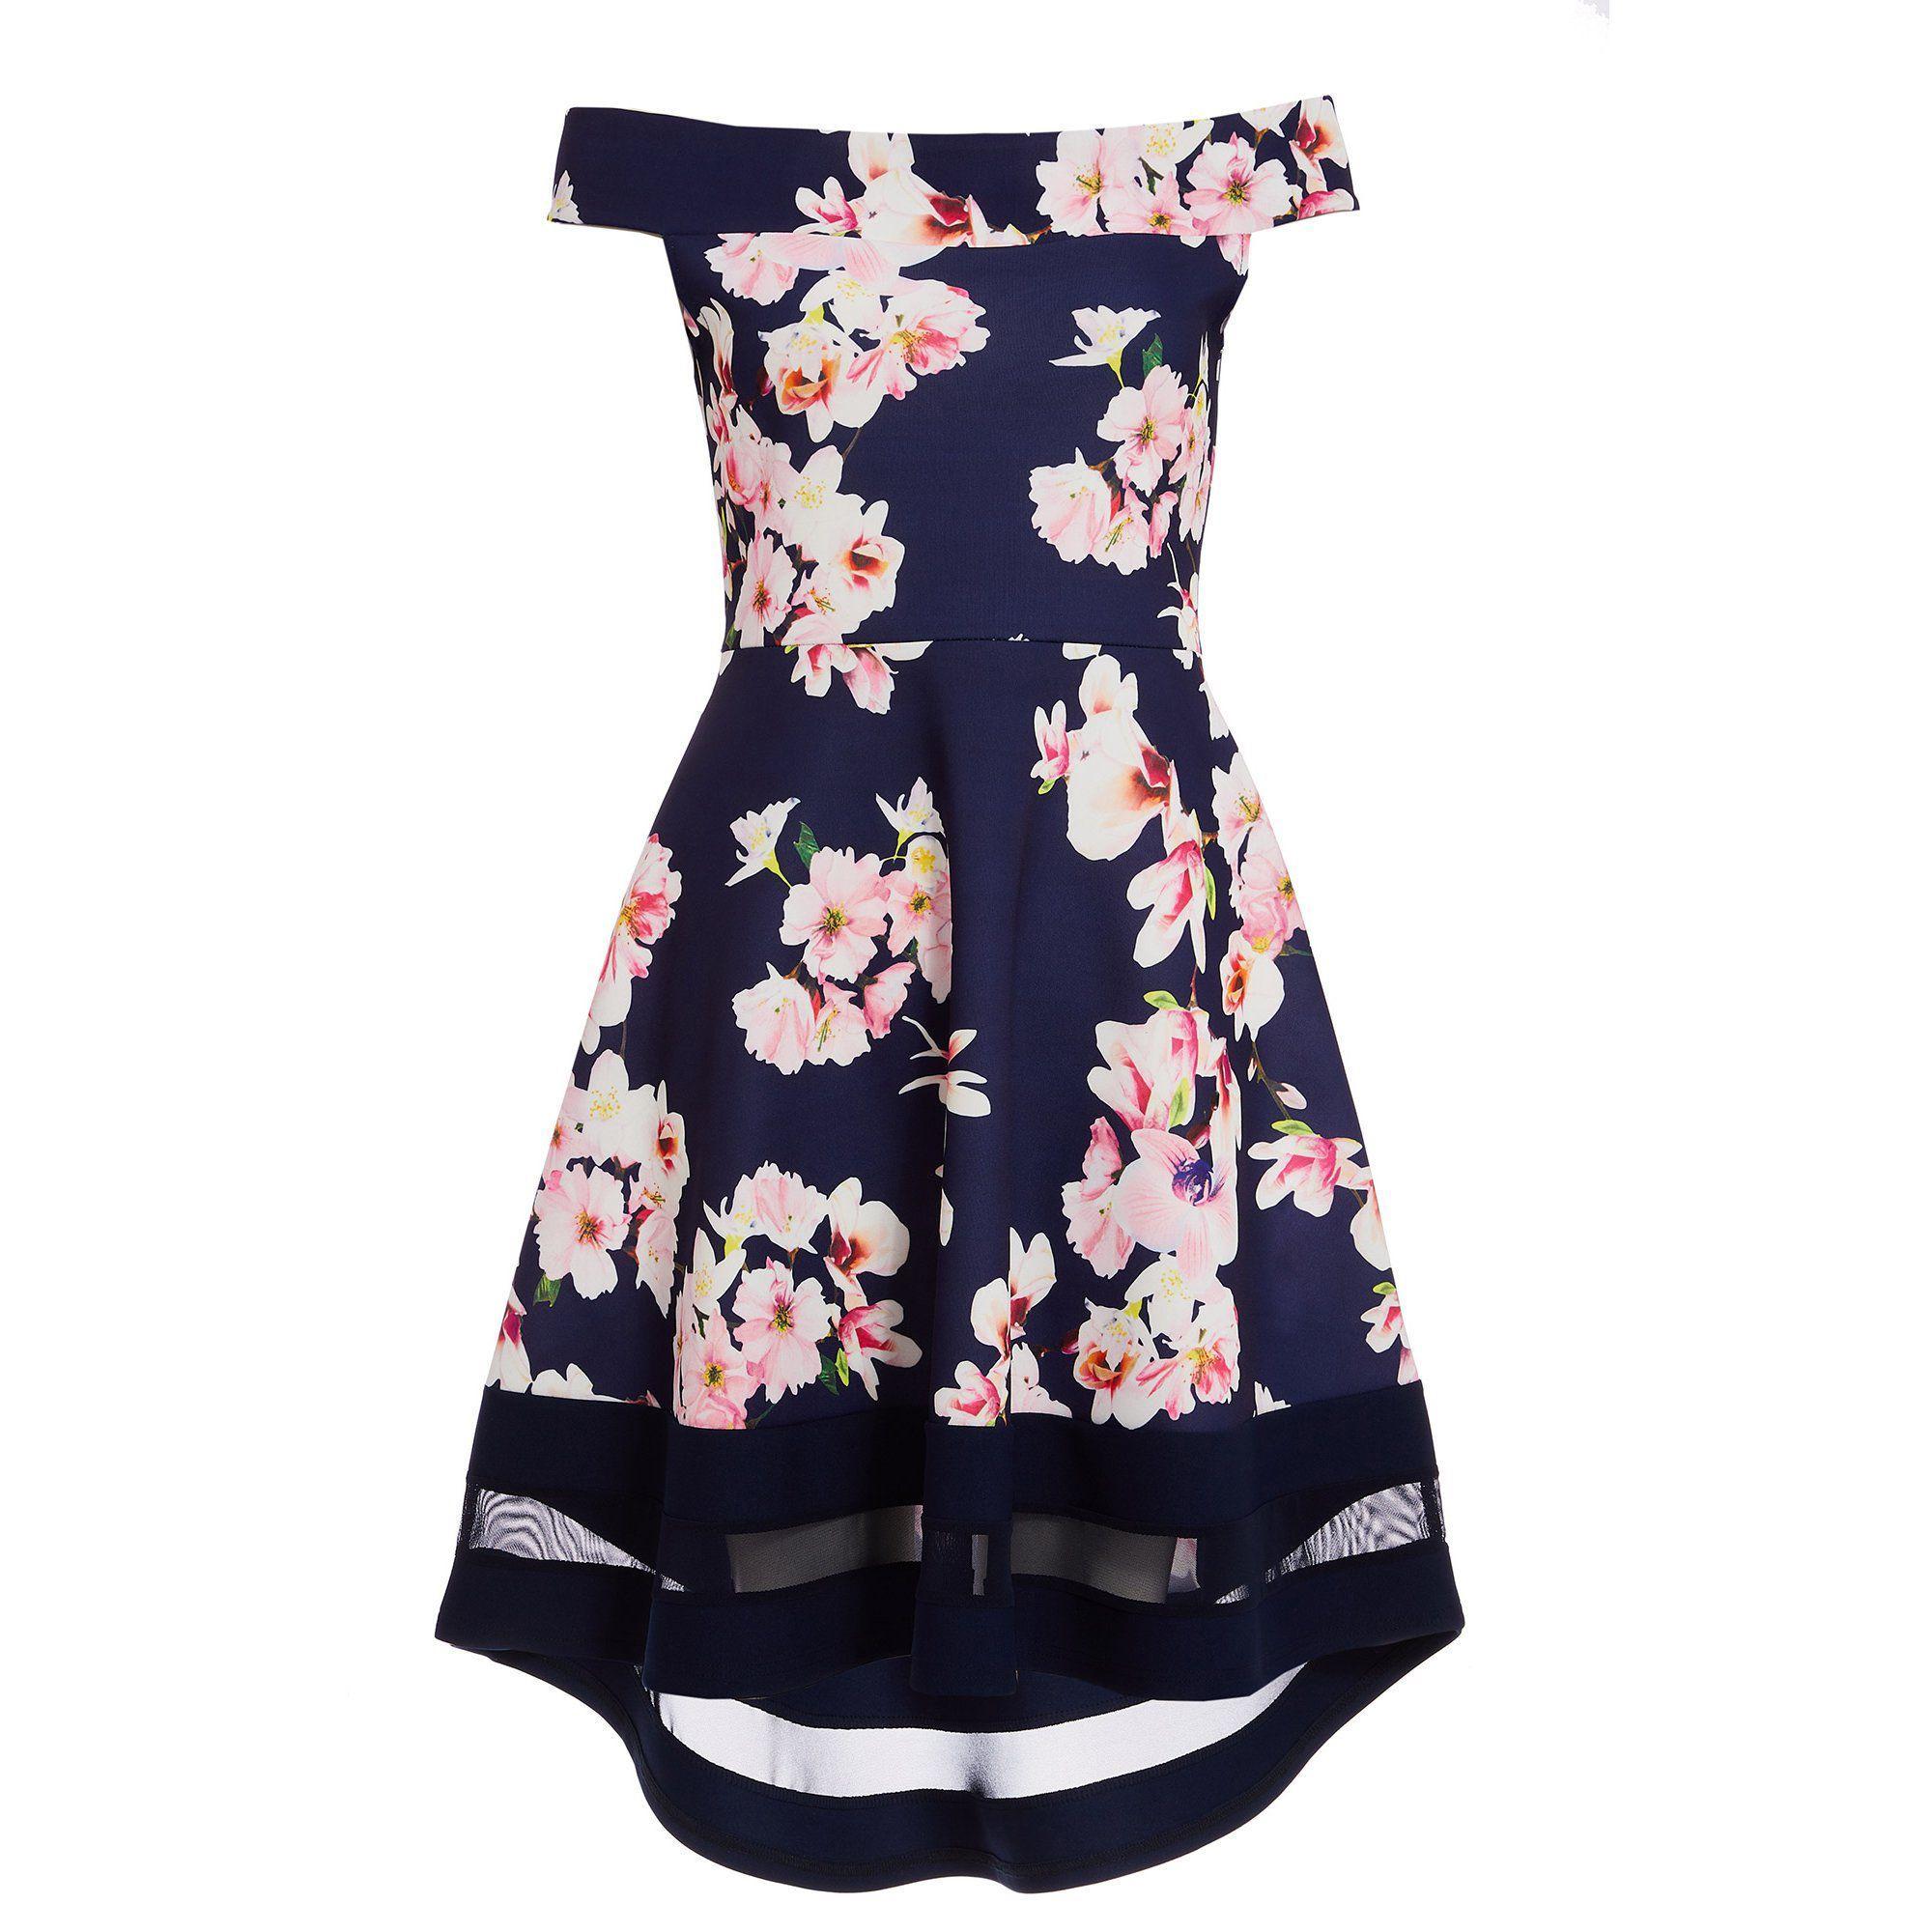 8b8ff7bf1c6c Quiz Navy Pink And Cream Floral Bardot Dip Hem Dress in Blue - Lyst